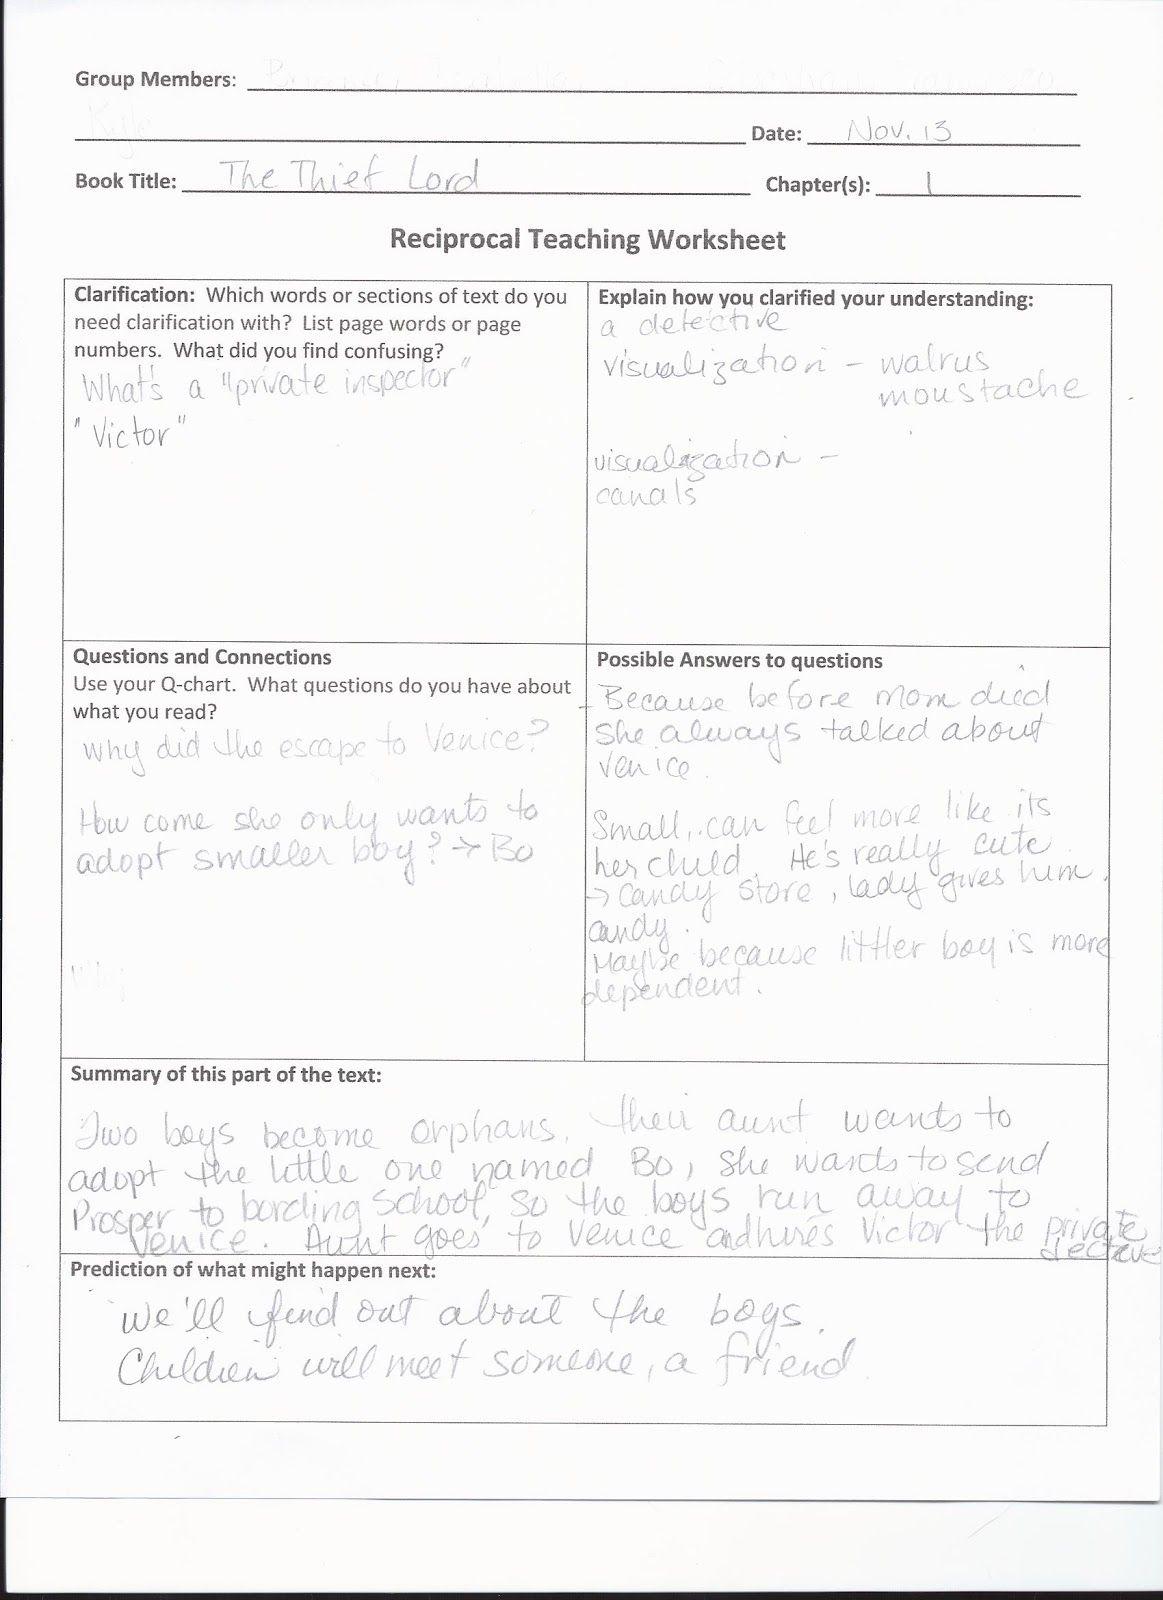 Image Result For Reciprocal Teaching Worksheet